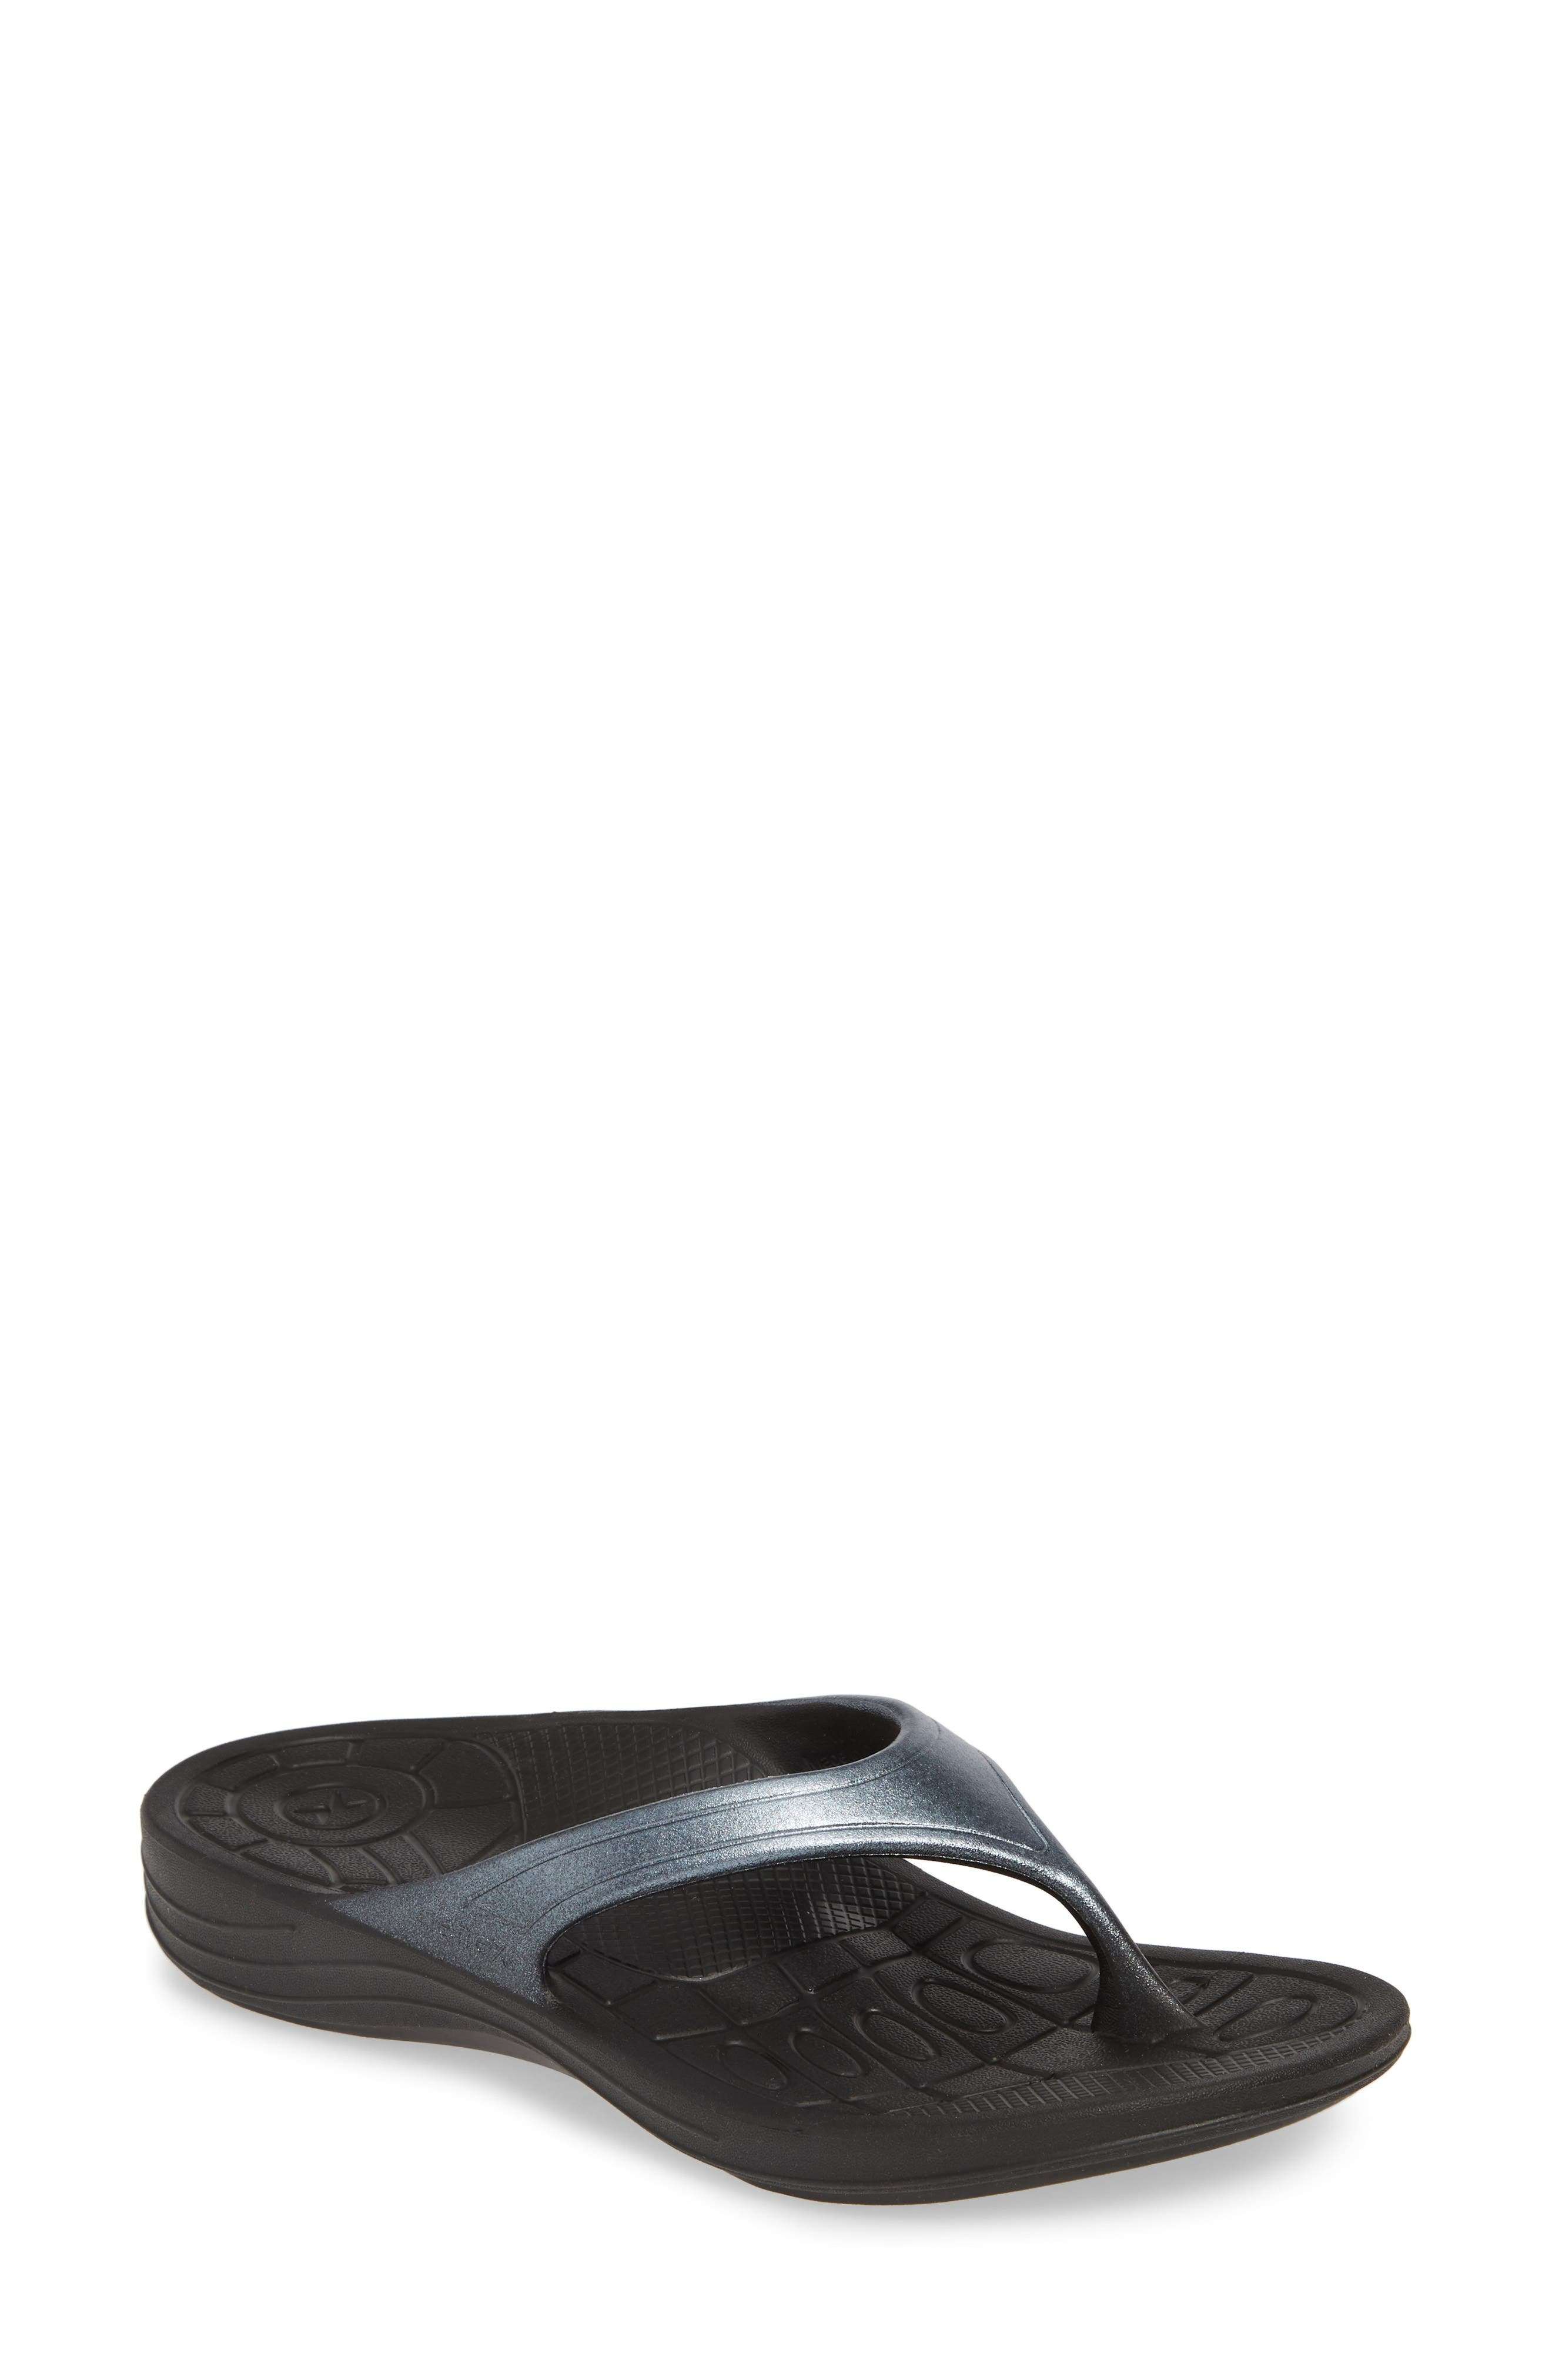 Aetrex Fiji Flip Flop, Black